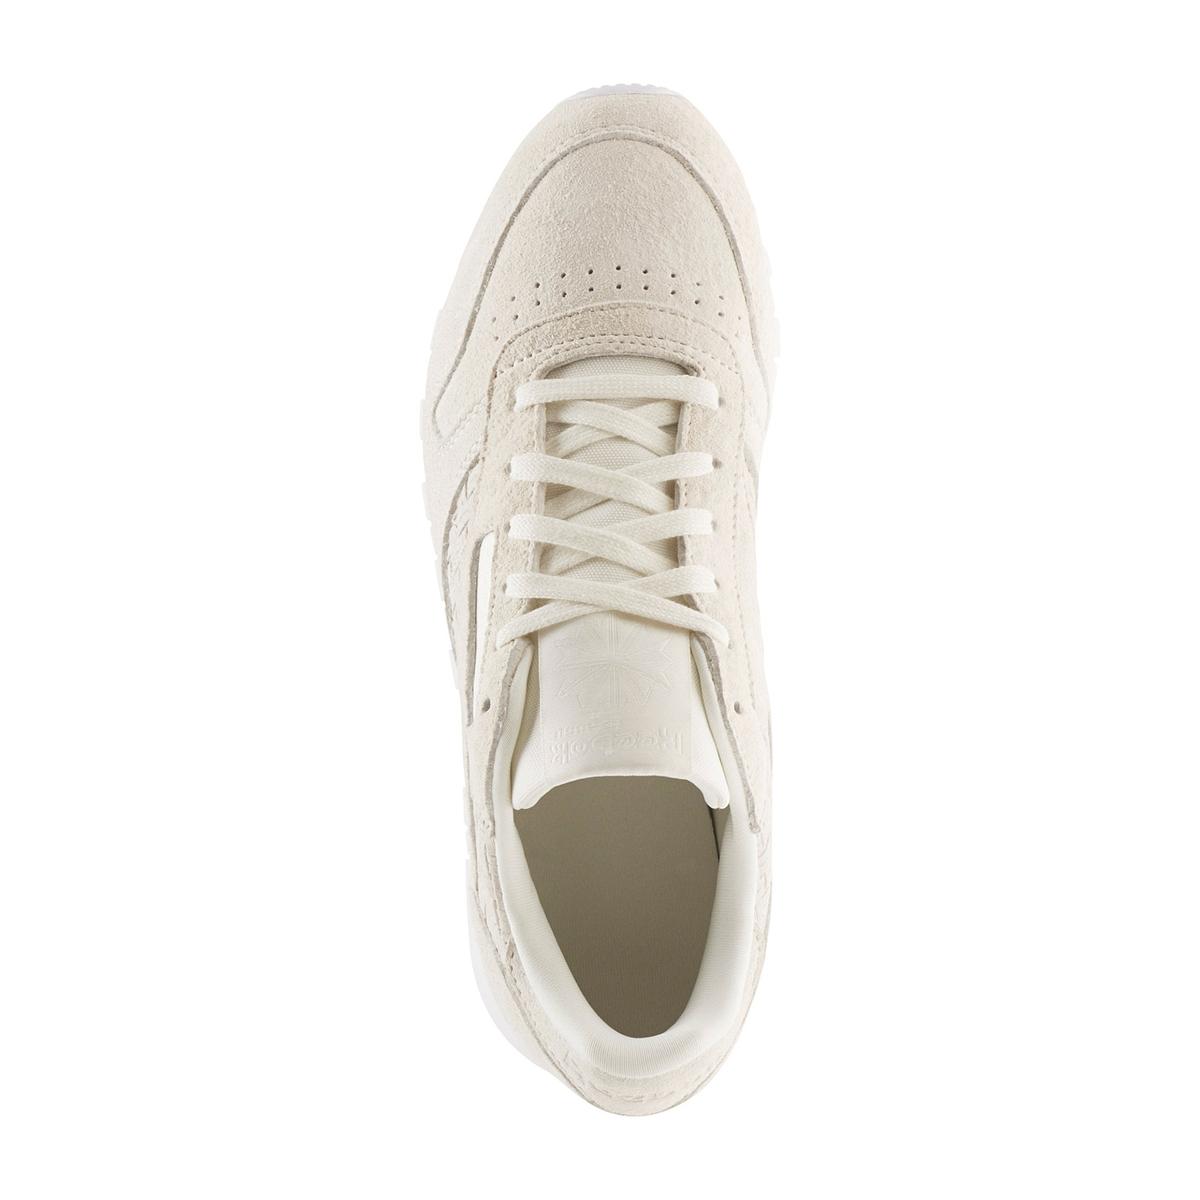 Imagen adicional 2 de producto de Zapatillas Classic Leather Woven - Reebok